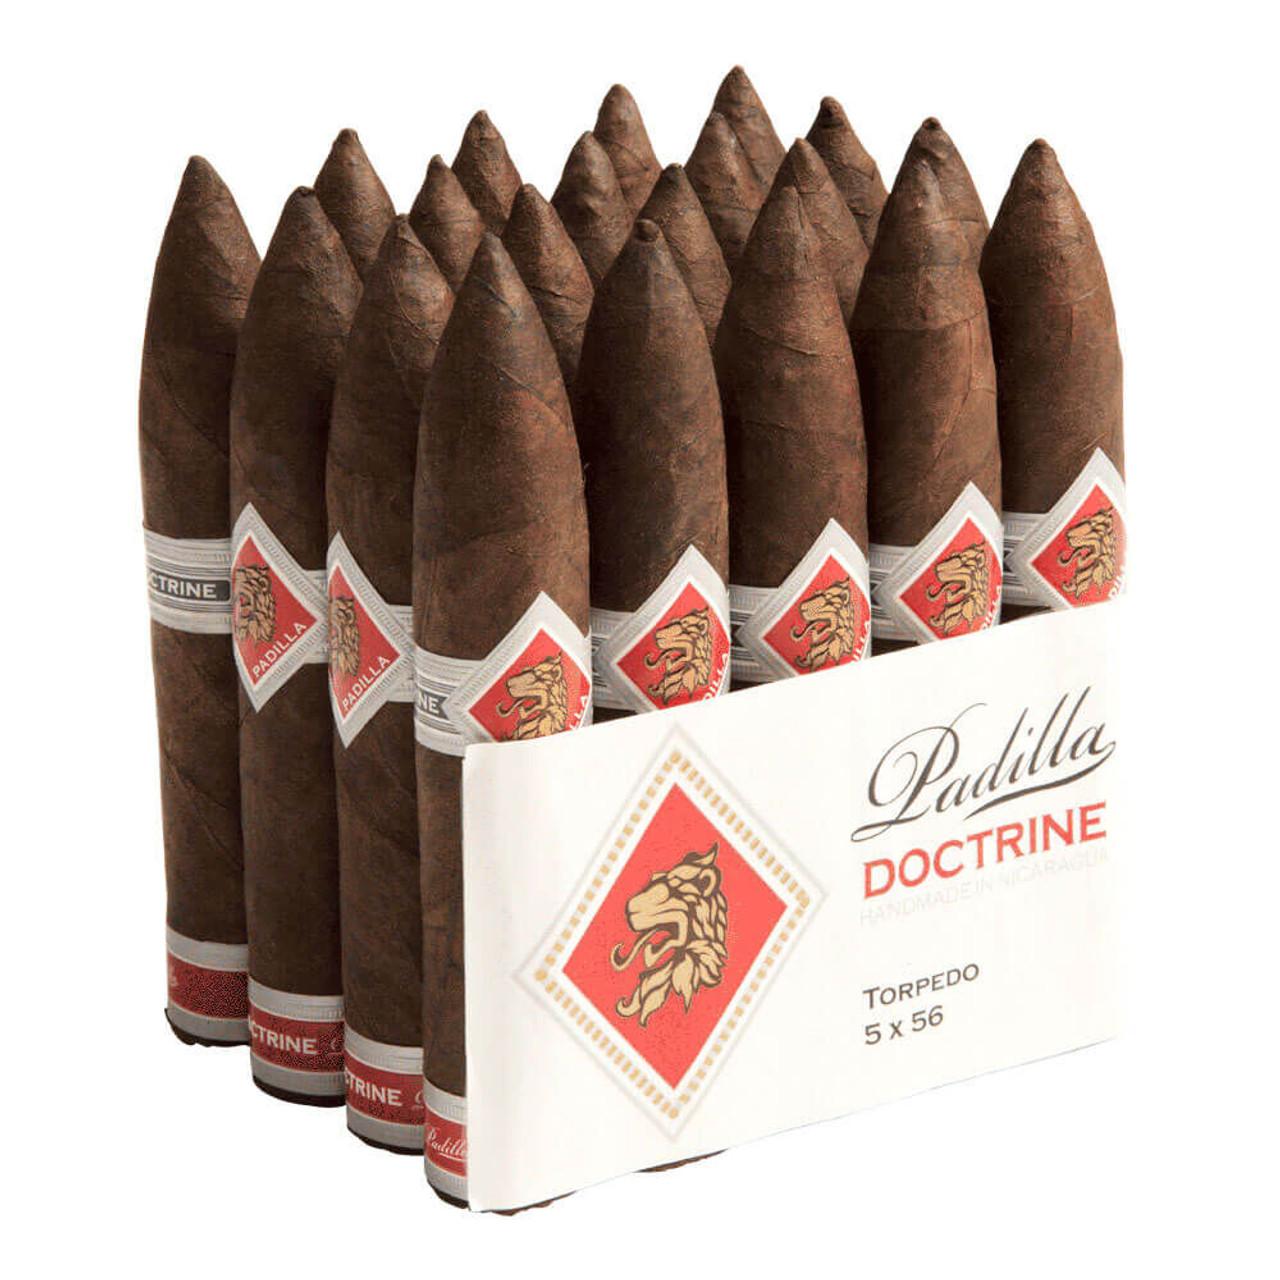 Padilla Doctrine Torpedo Cigars - 5.0 x 56 (Bundle of 20)